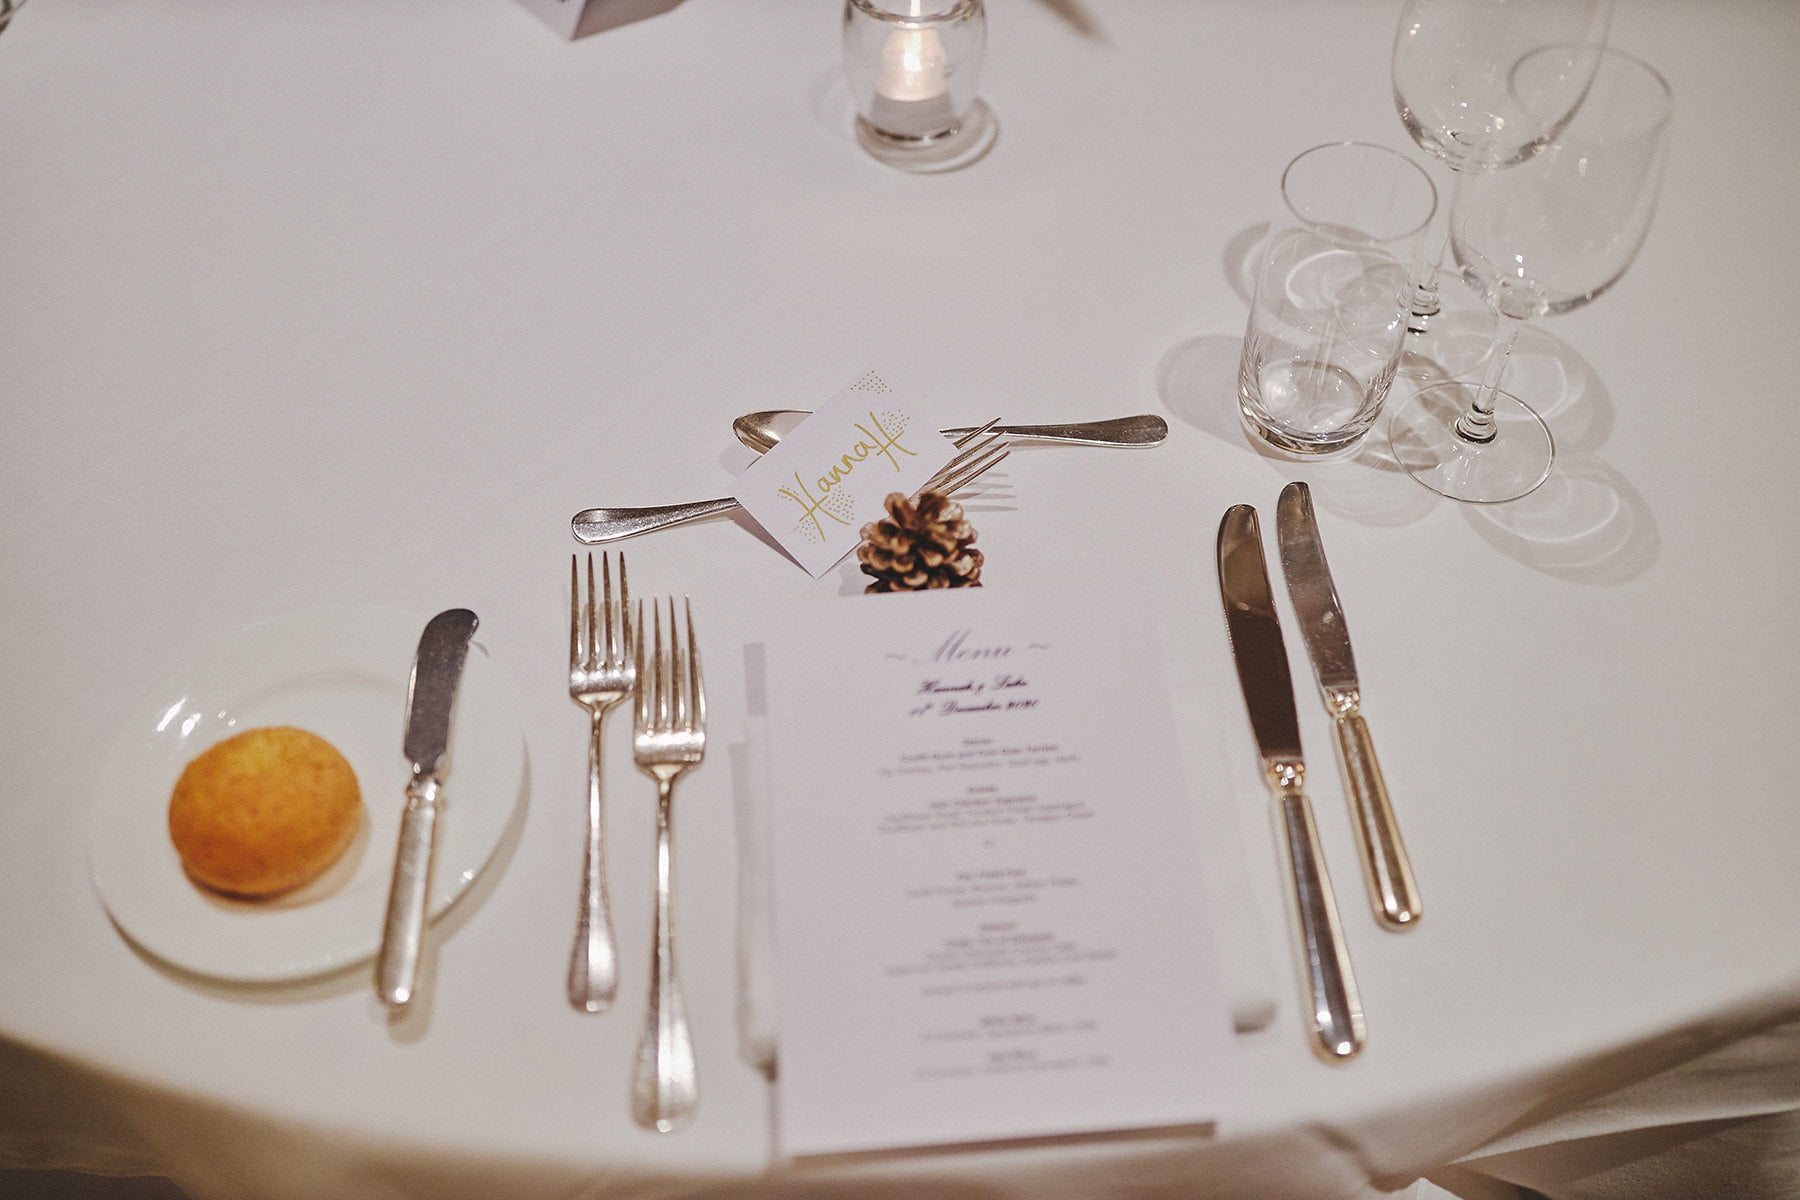 POWERSCOURT HOTEL RESORT INTIMATE WEDDING 88